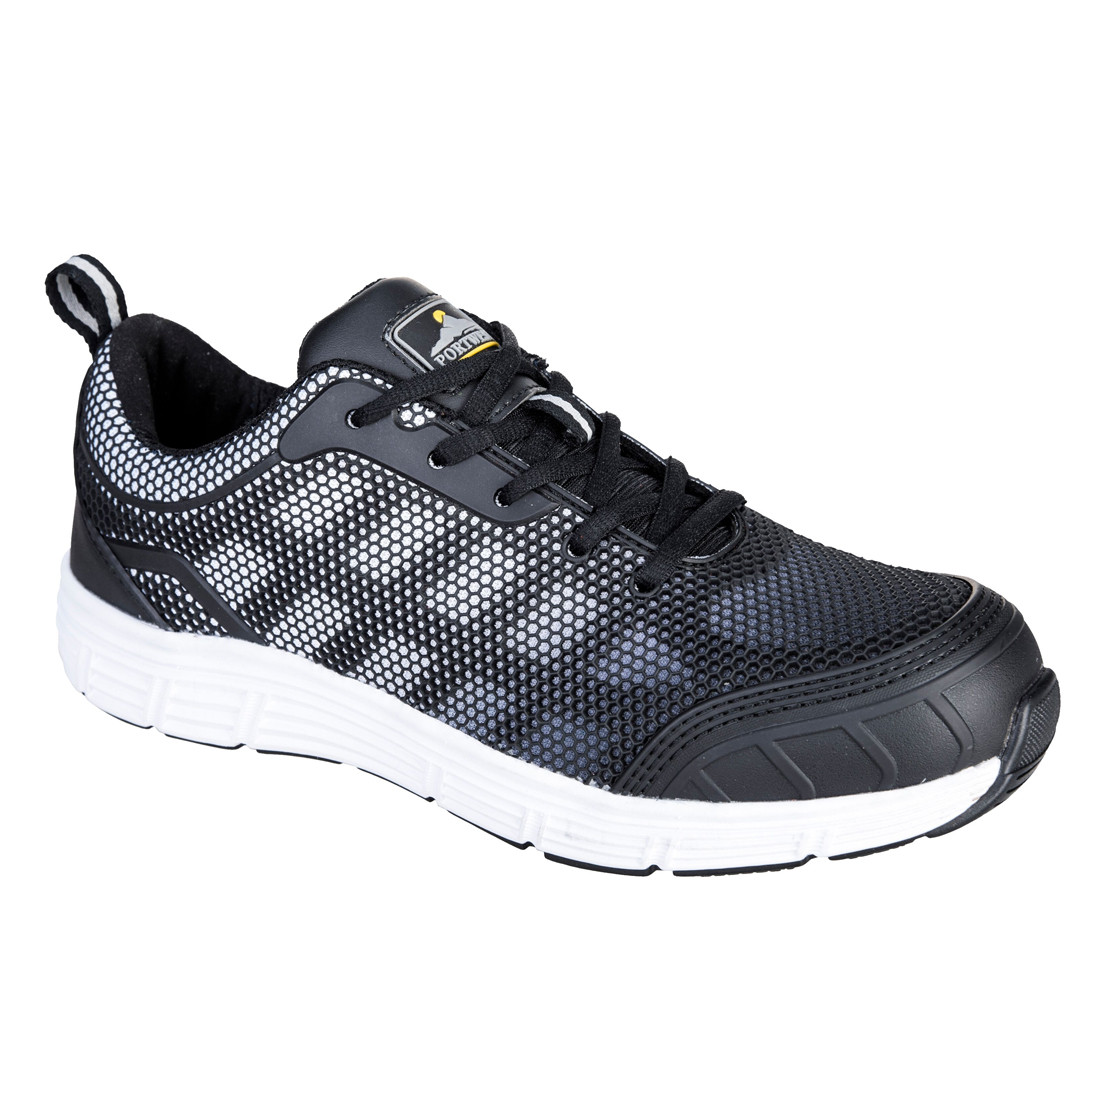 Pantofi Steelite Tove S1P - Incaltaminte de protectie